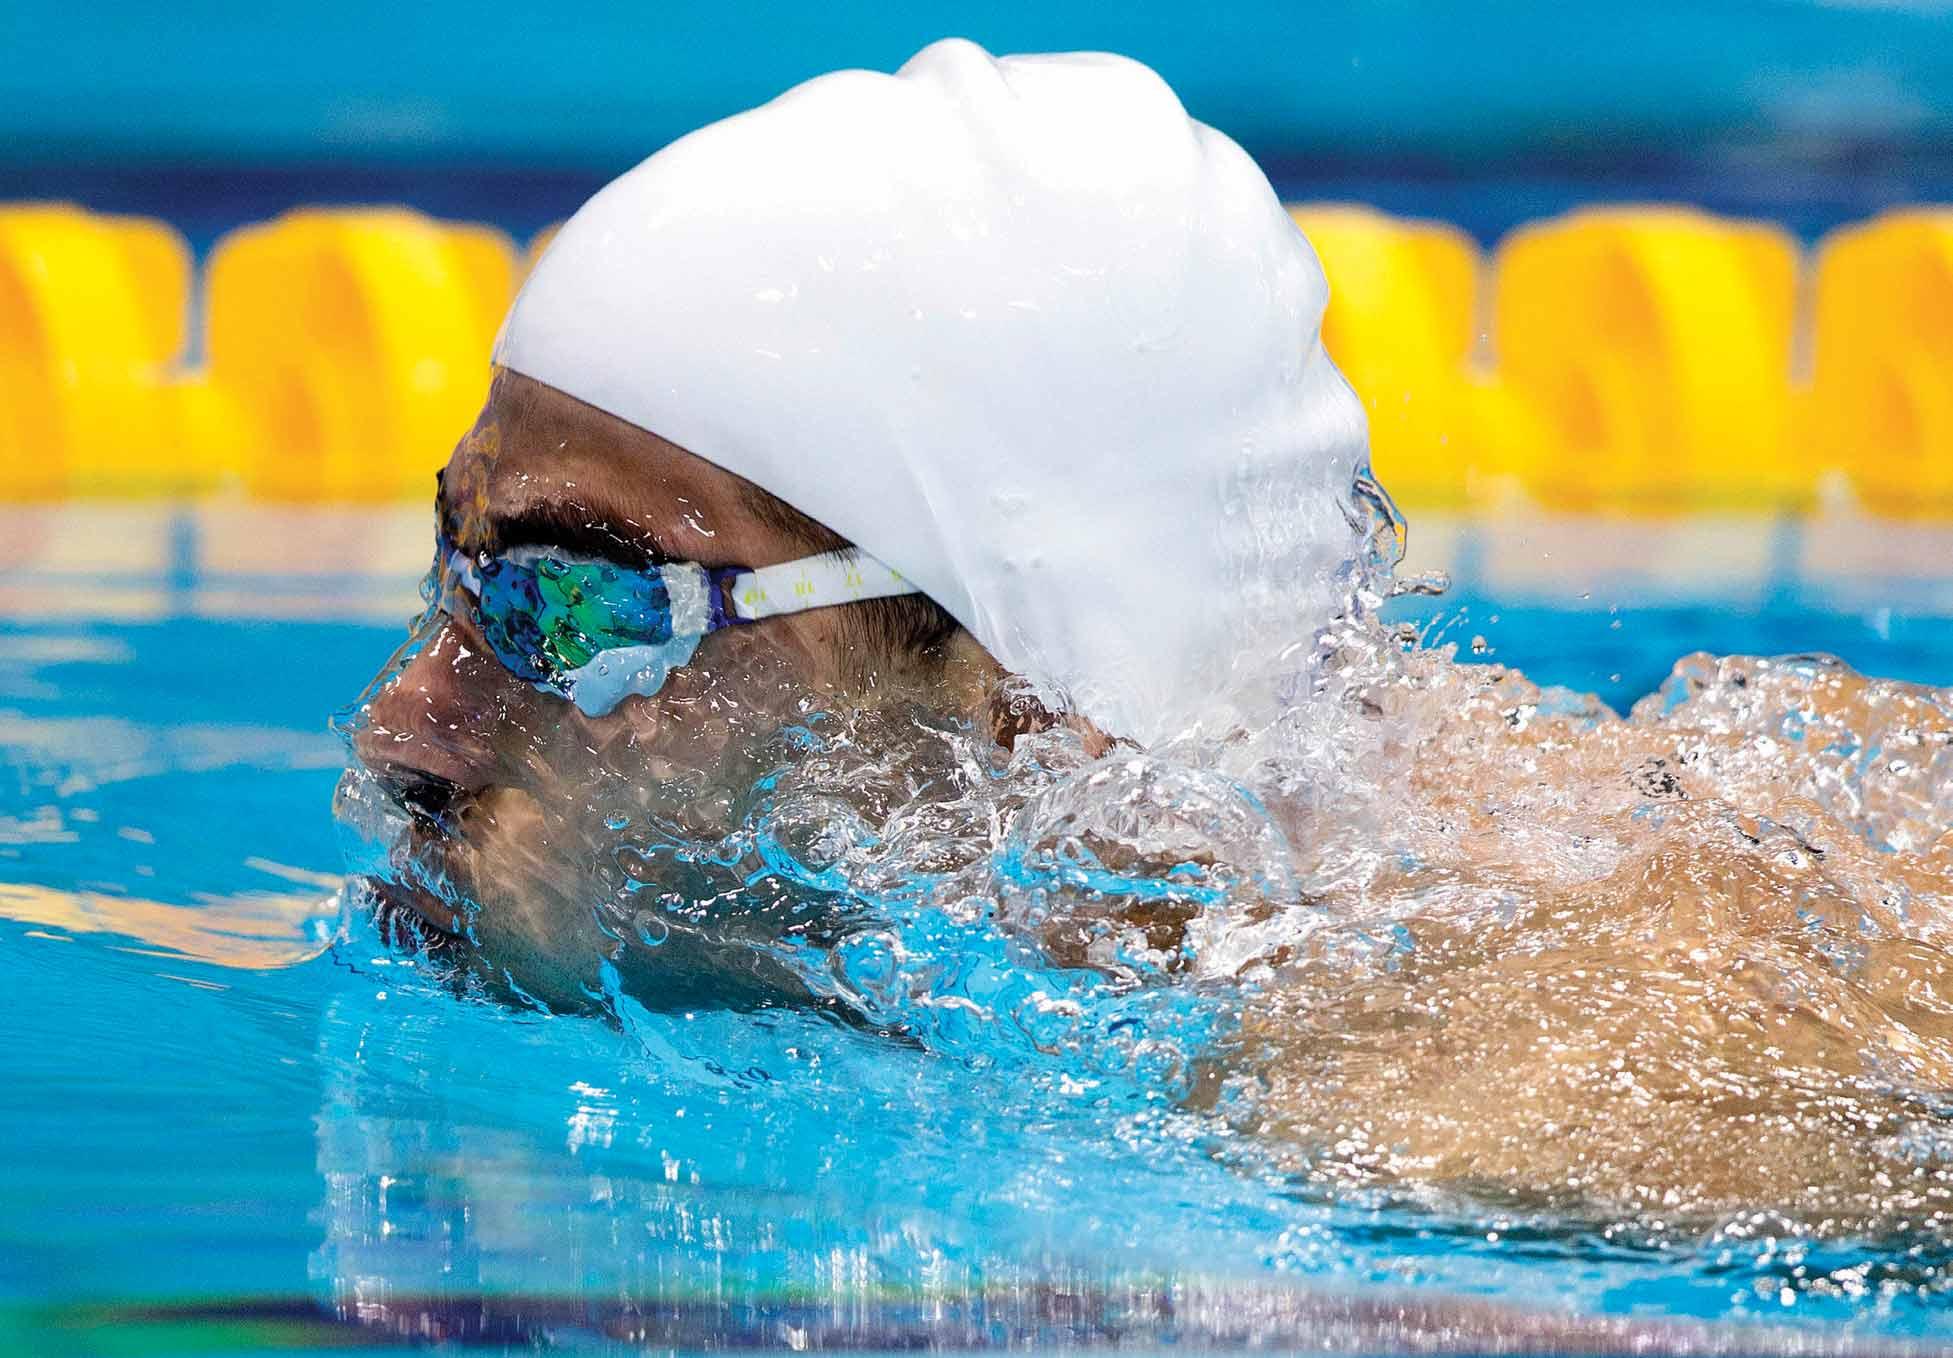 braganca-paulista-esportes-natacao-daniel-dias-2-bx